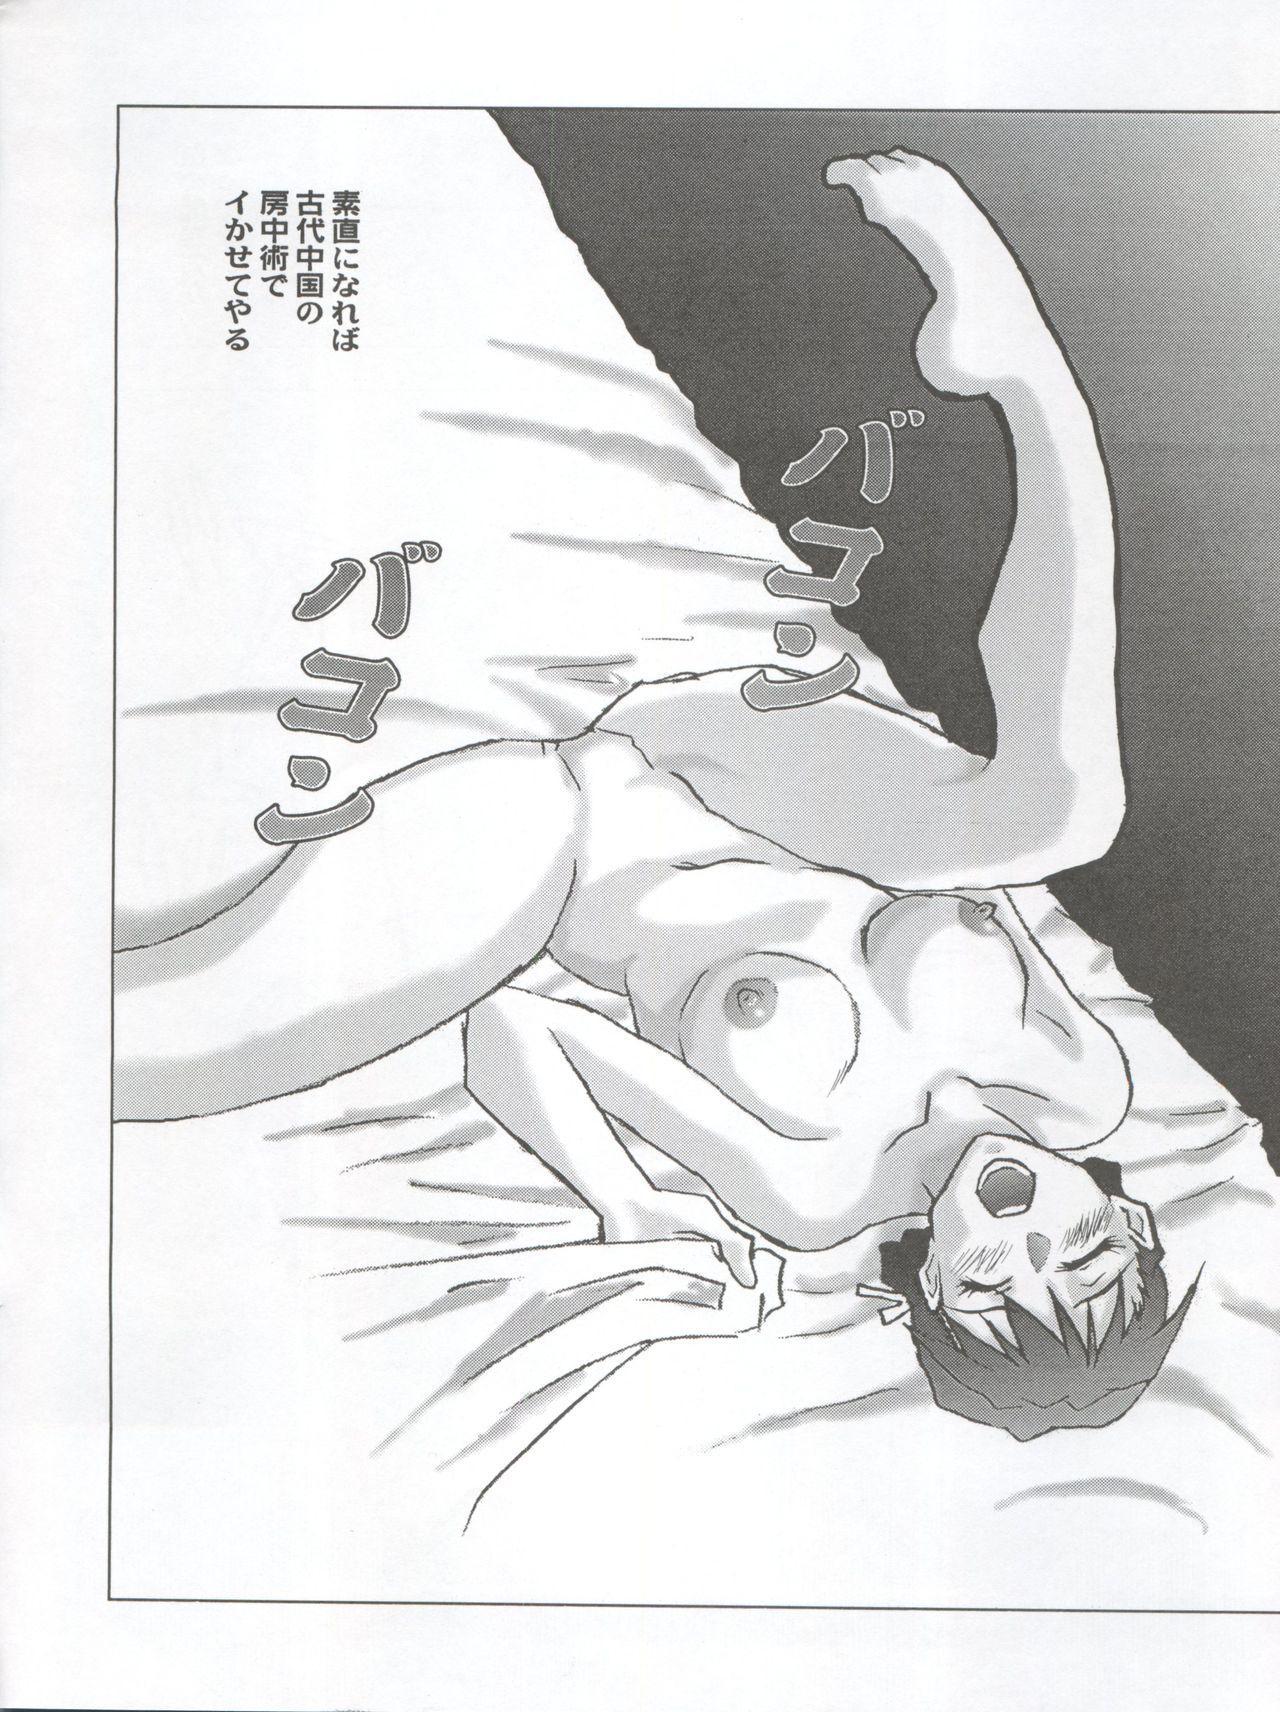 NEXT Climax Magazine 3 Gundam Series 33